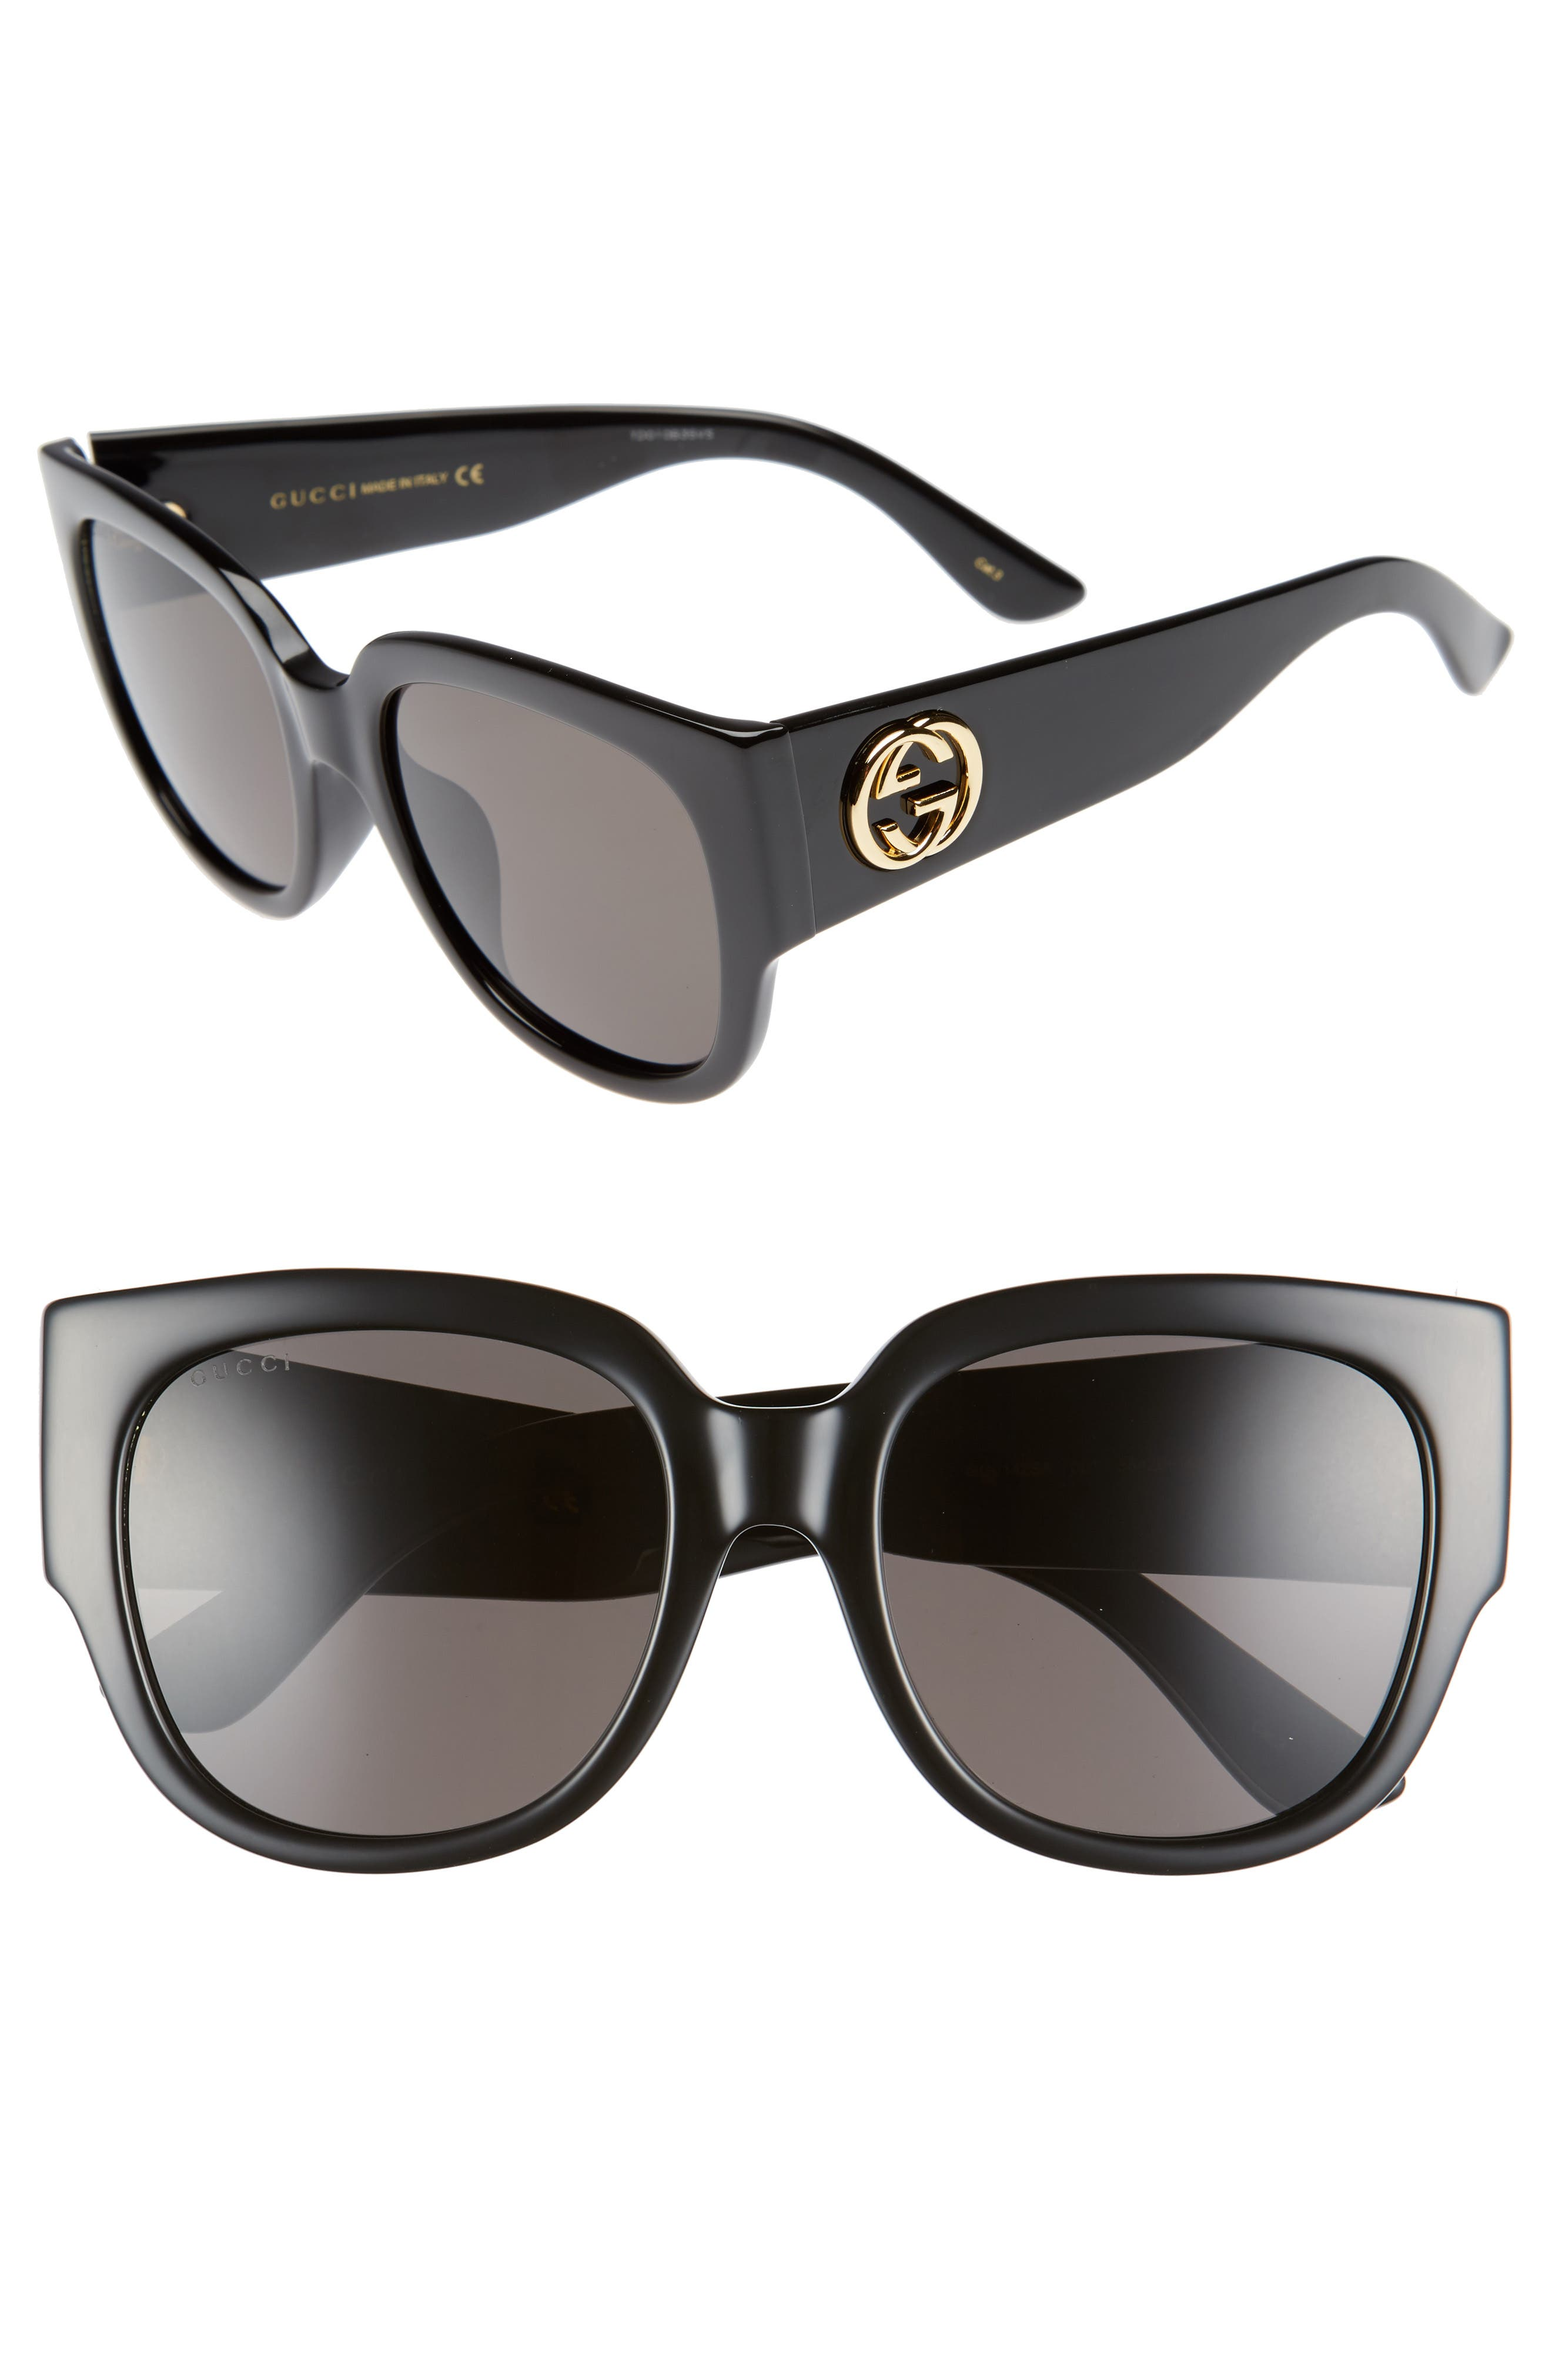 Main Image - Gucci 55mm Square Cat Eye Sunglasses